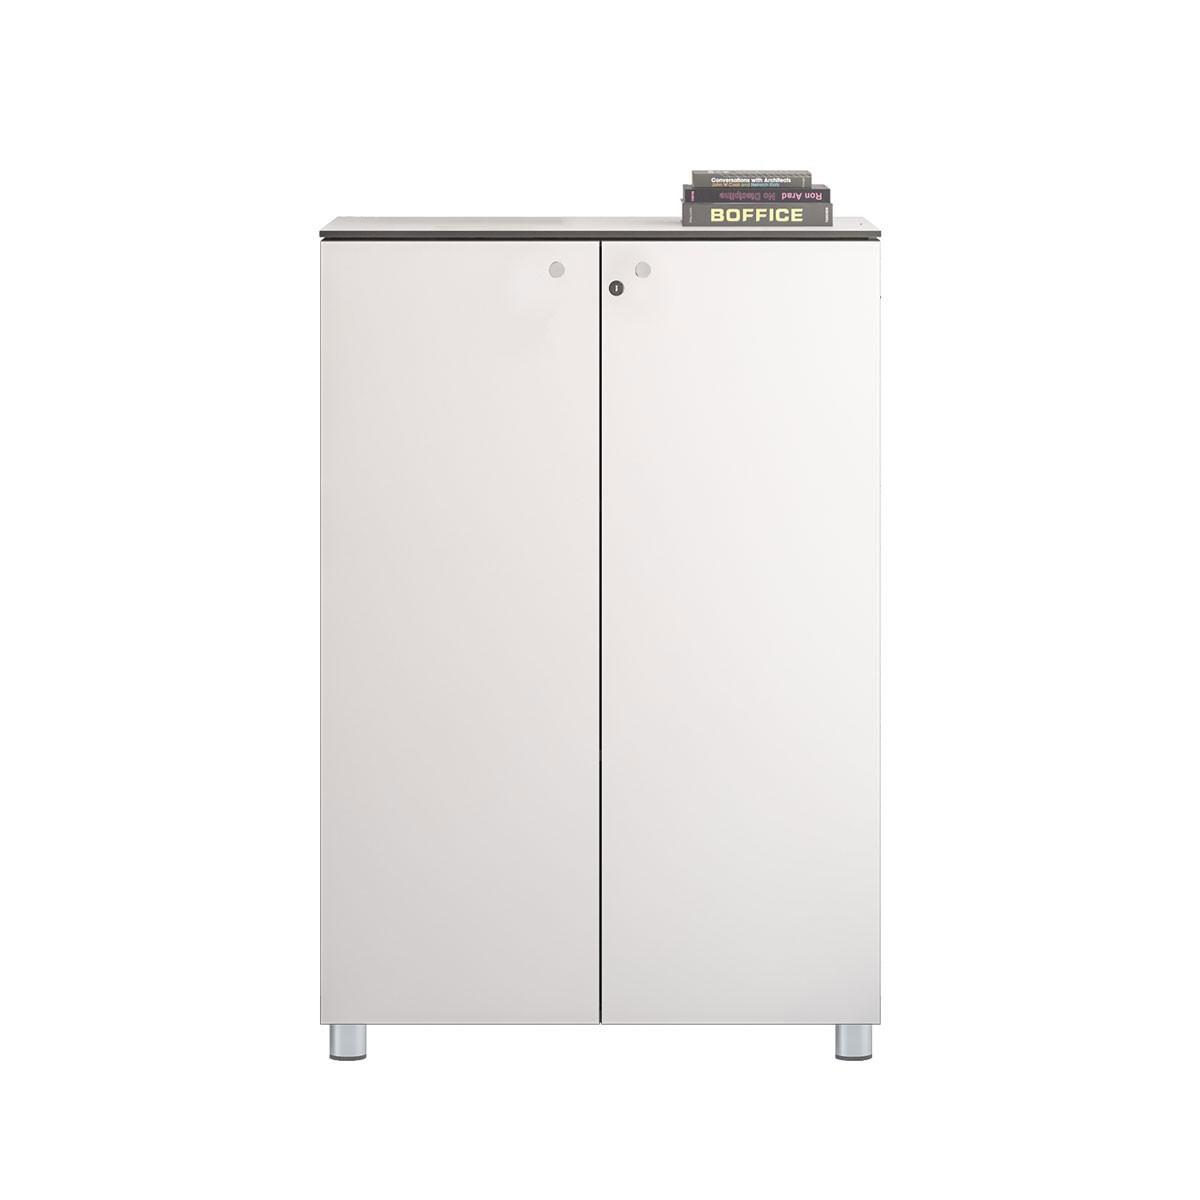 Office Storage Cabinets (GA23A)